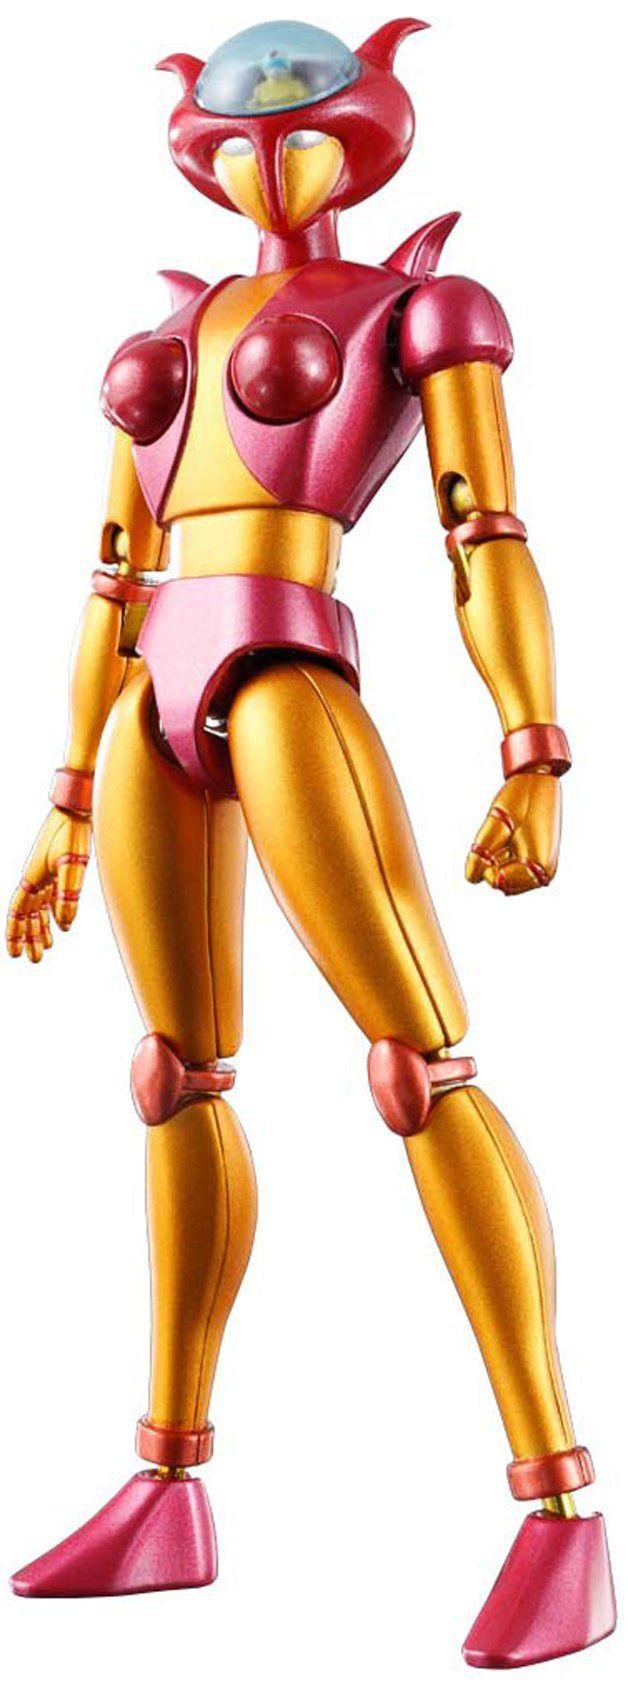 "Amazon.com: Bandai Tamashii Nations Soul of Chogokin Aphrodite A ""Mazinger Z"" Action Figure: Toys & Games"